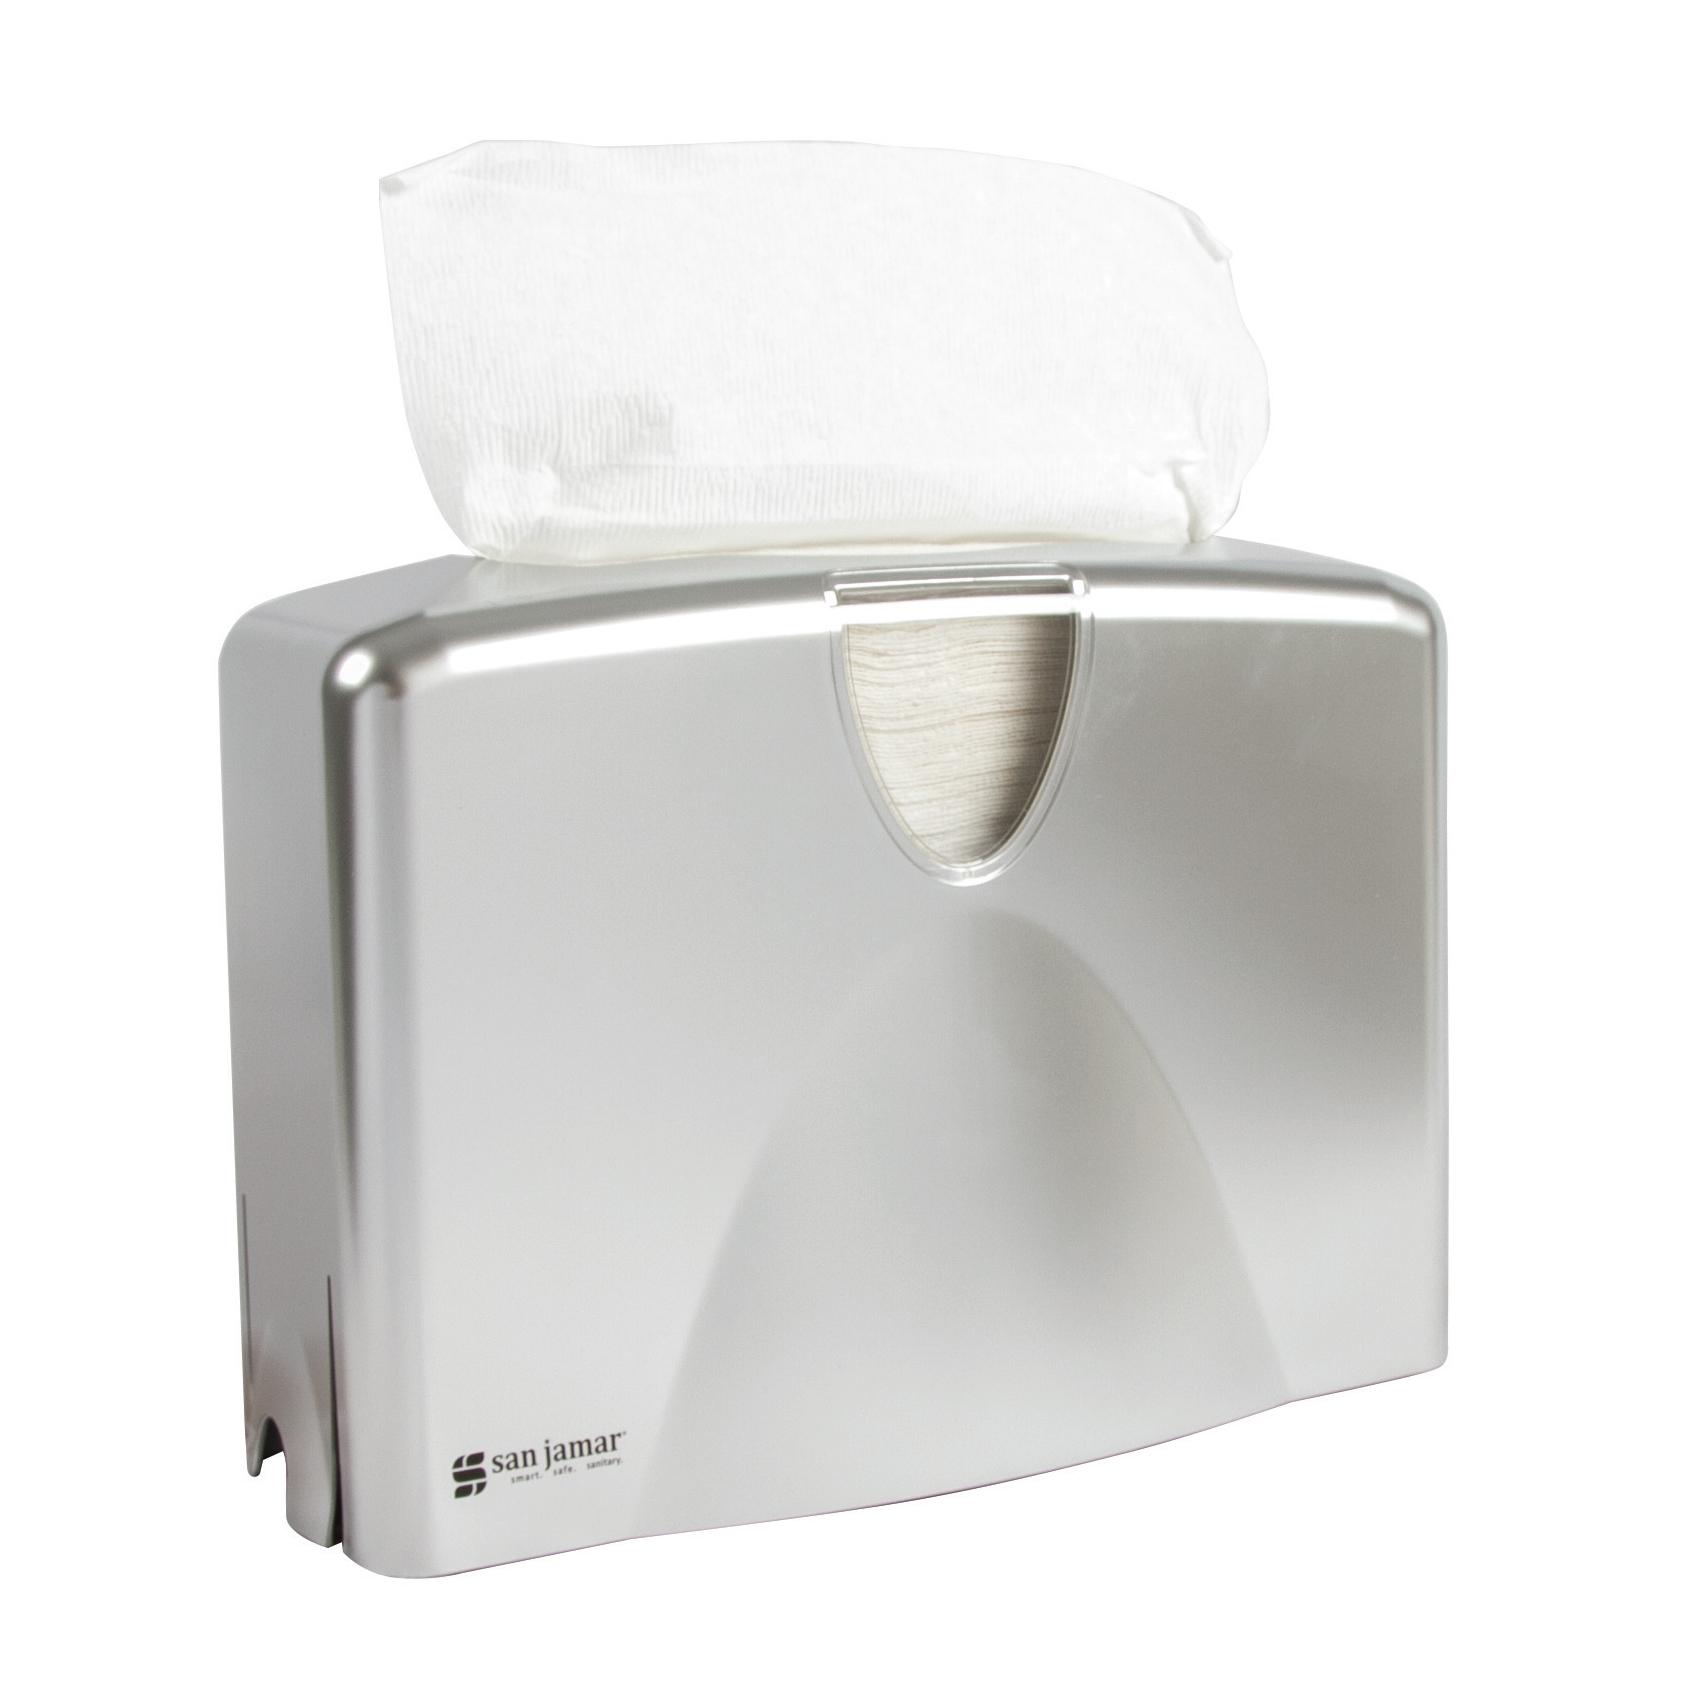 San Jamar T1740SS paper towel dispenser